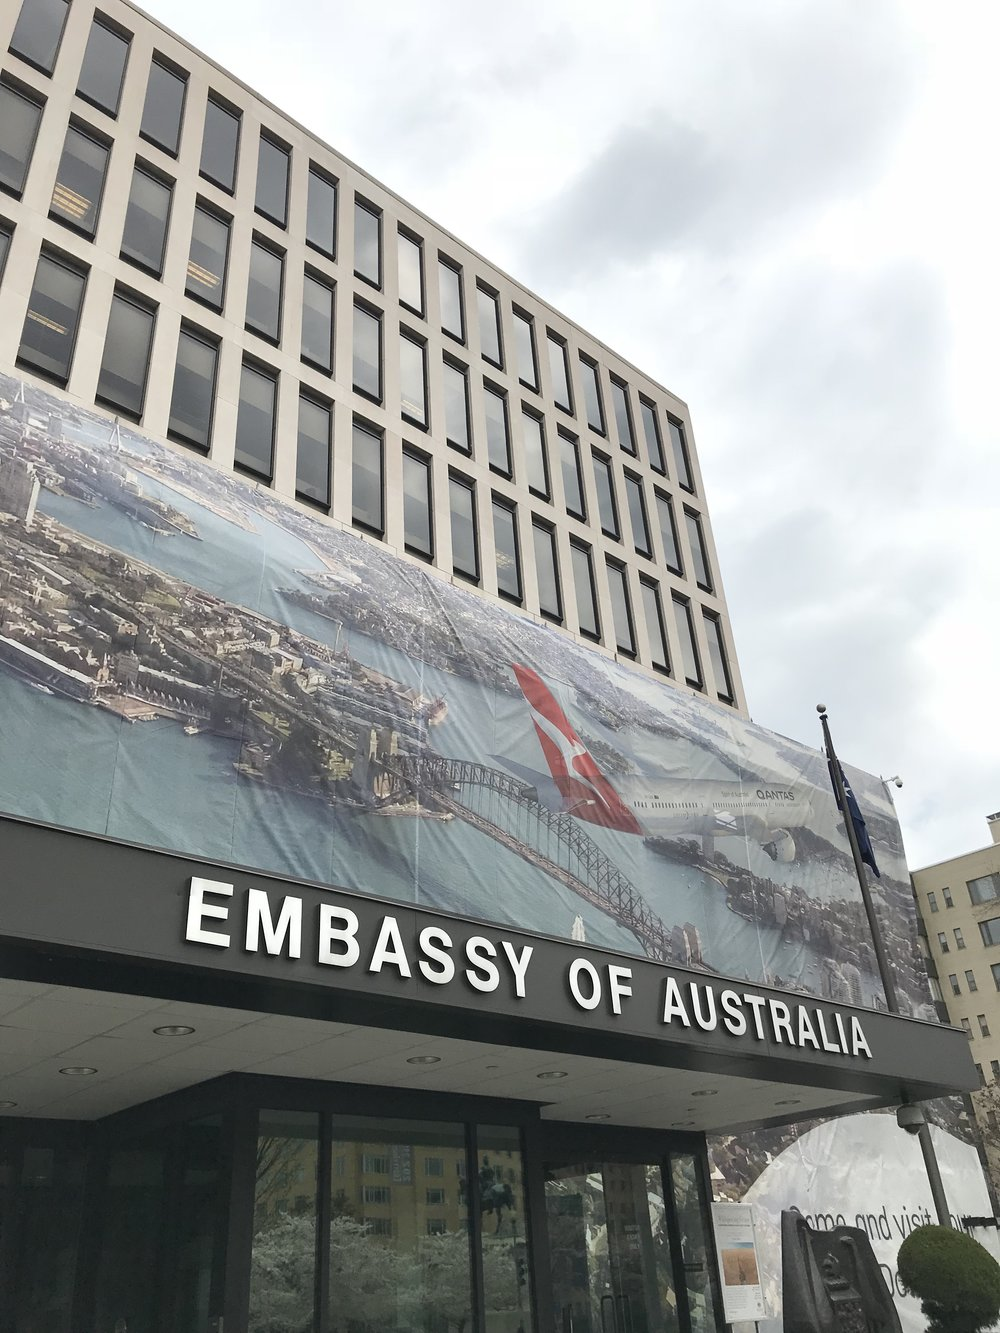 The Embassy of Australia.